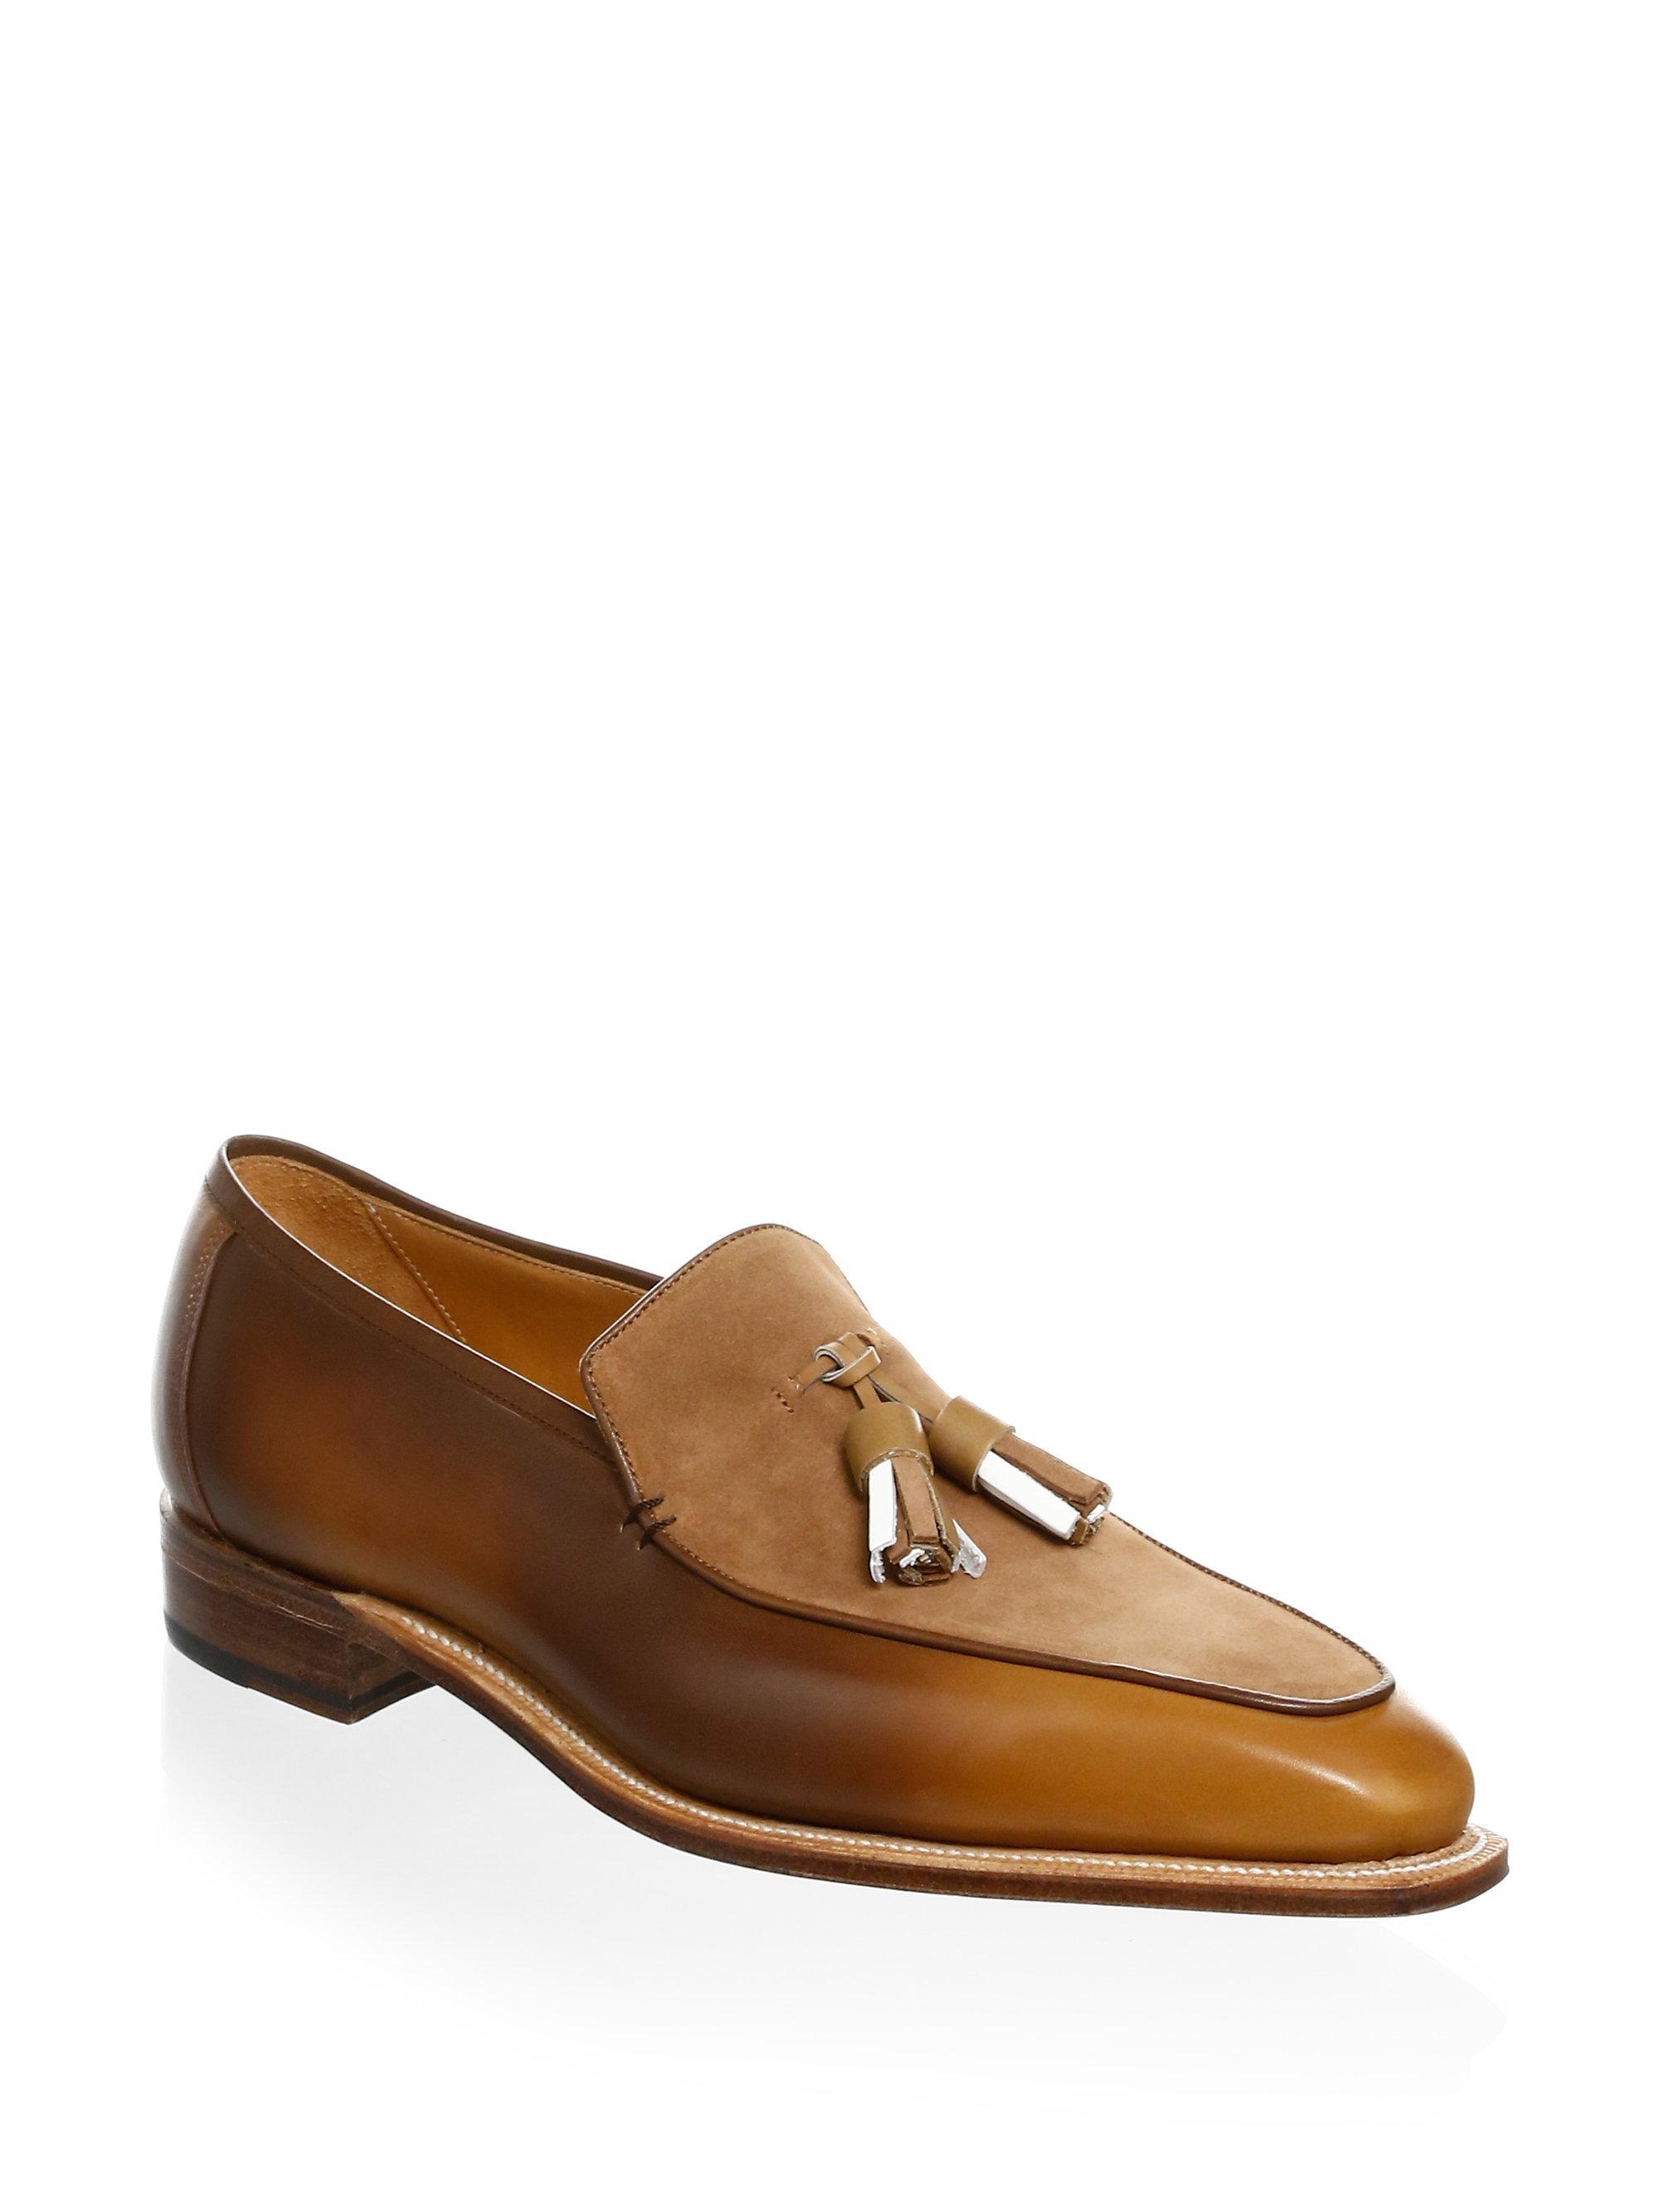 CORTHAY Dover Tassel Loafers SbD1rHjM